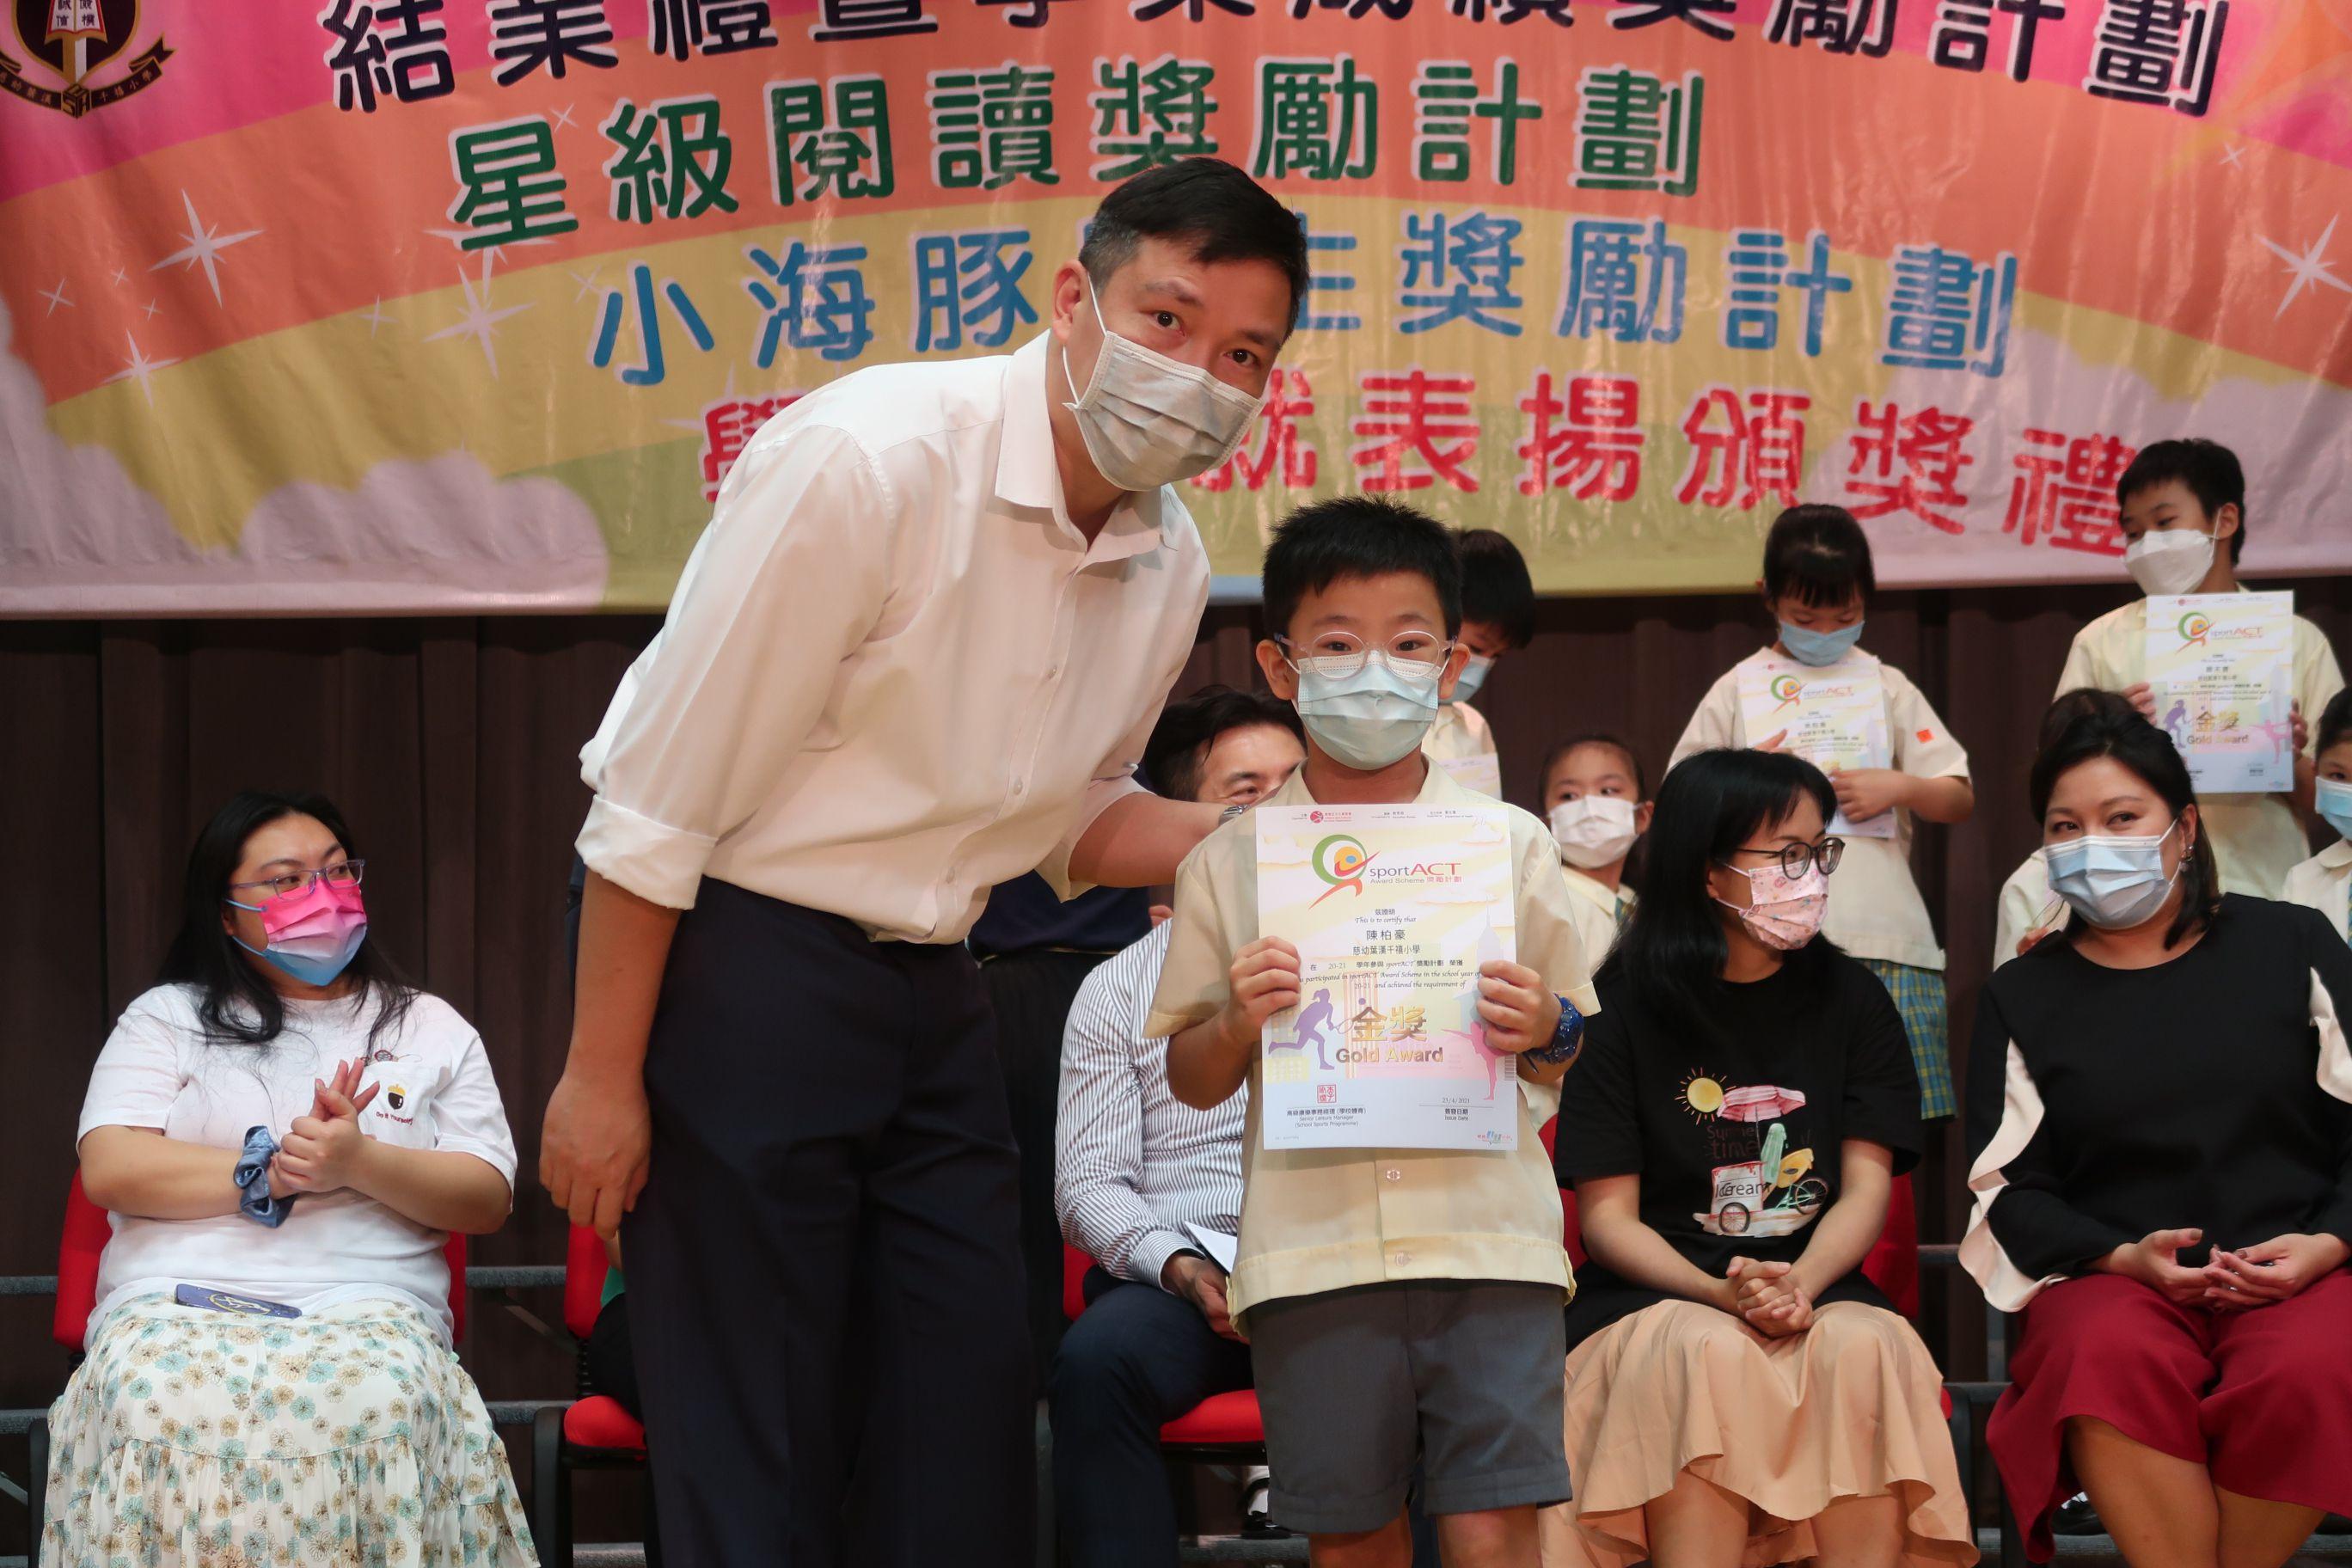 https://syh.edu.hk/sites/default/files/img_5905.jpg